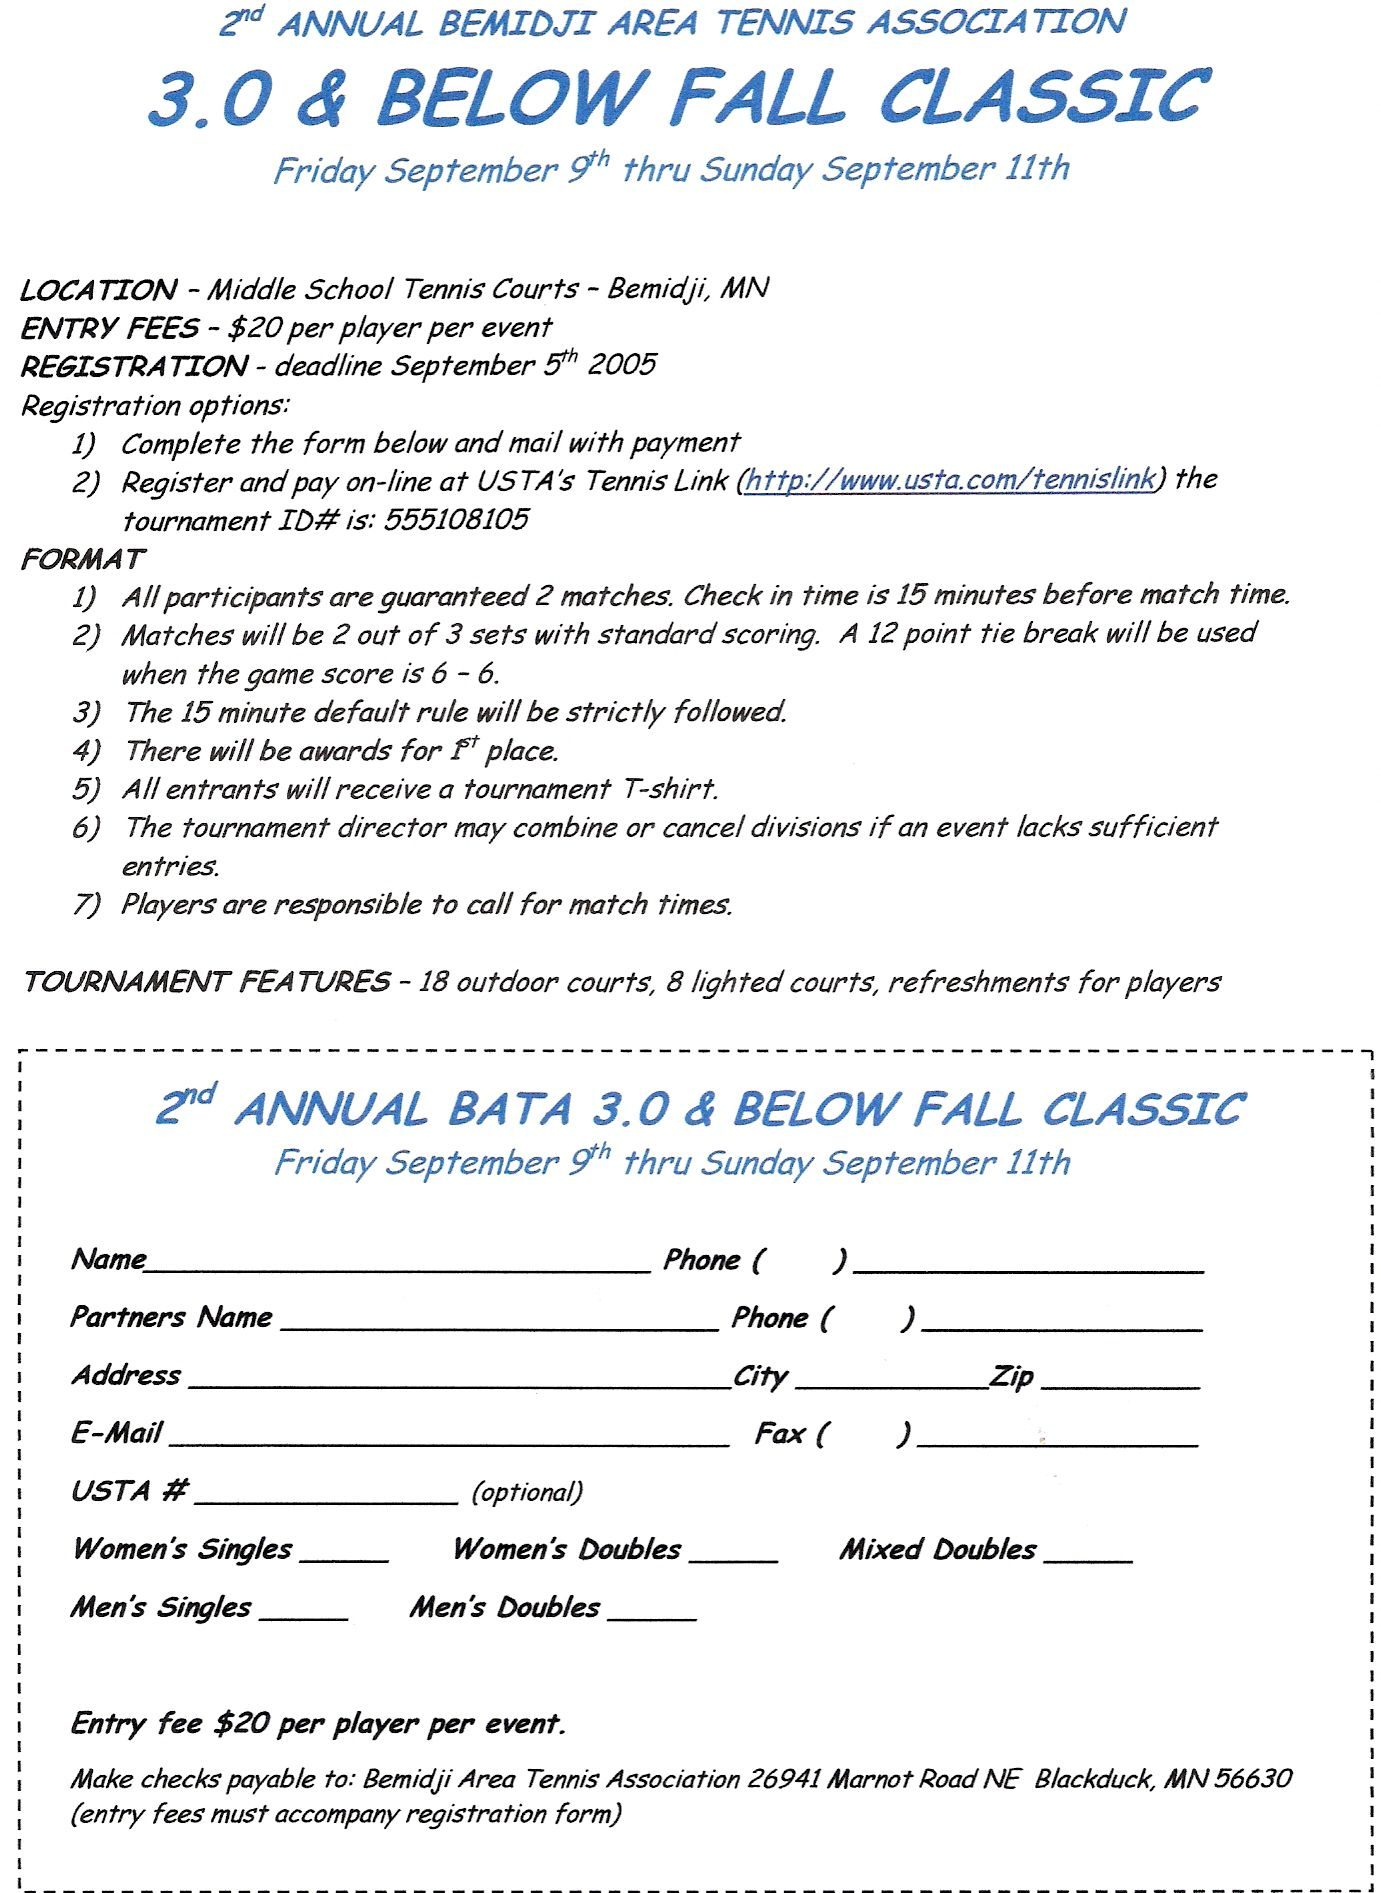 BATA  2005  3.0 & Below Fall Classic